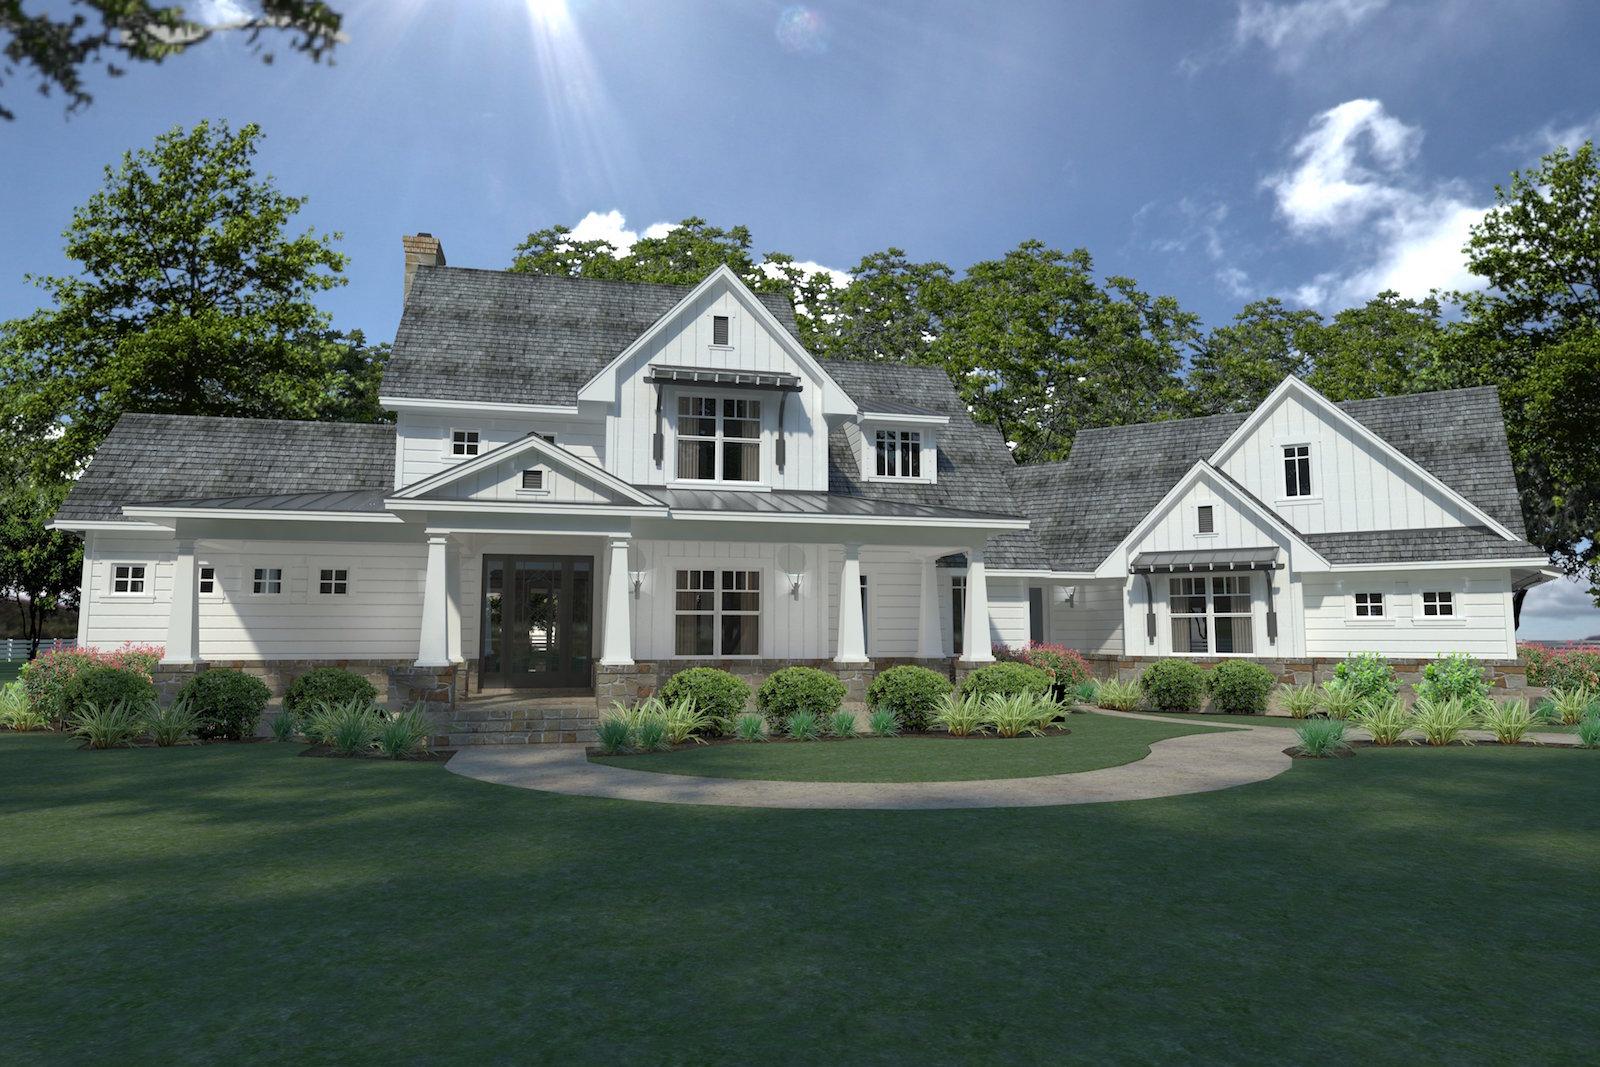 3 Bedrm 2396 Sq Ft Farmhouse House Plan 117 1124